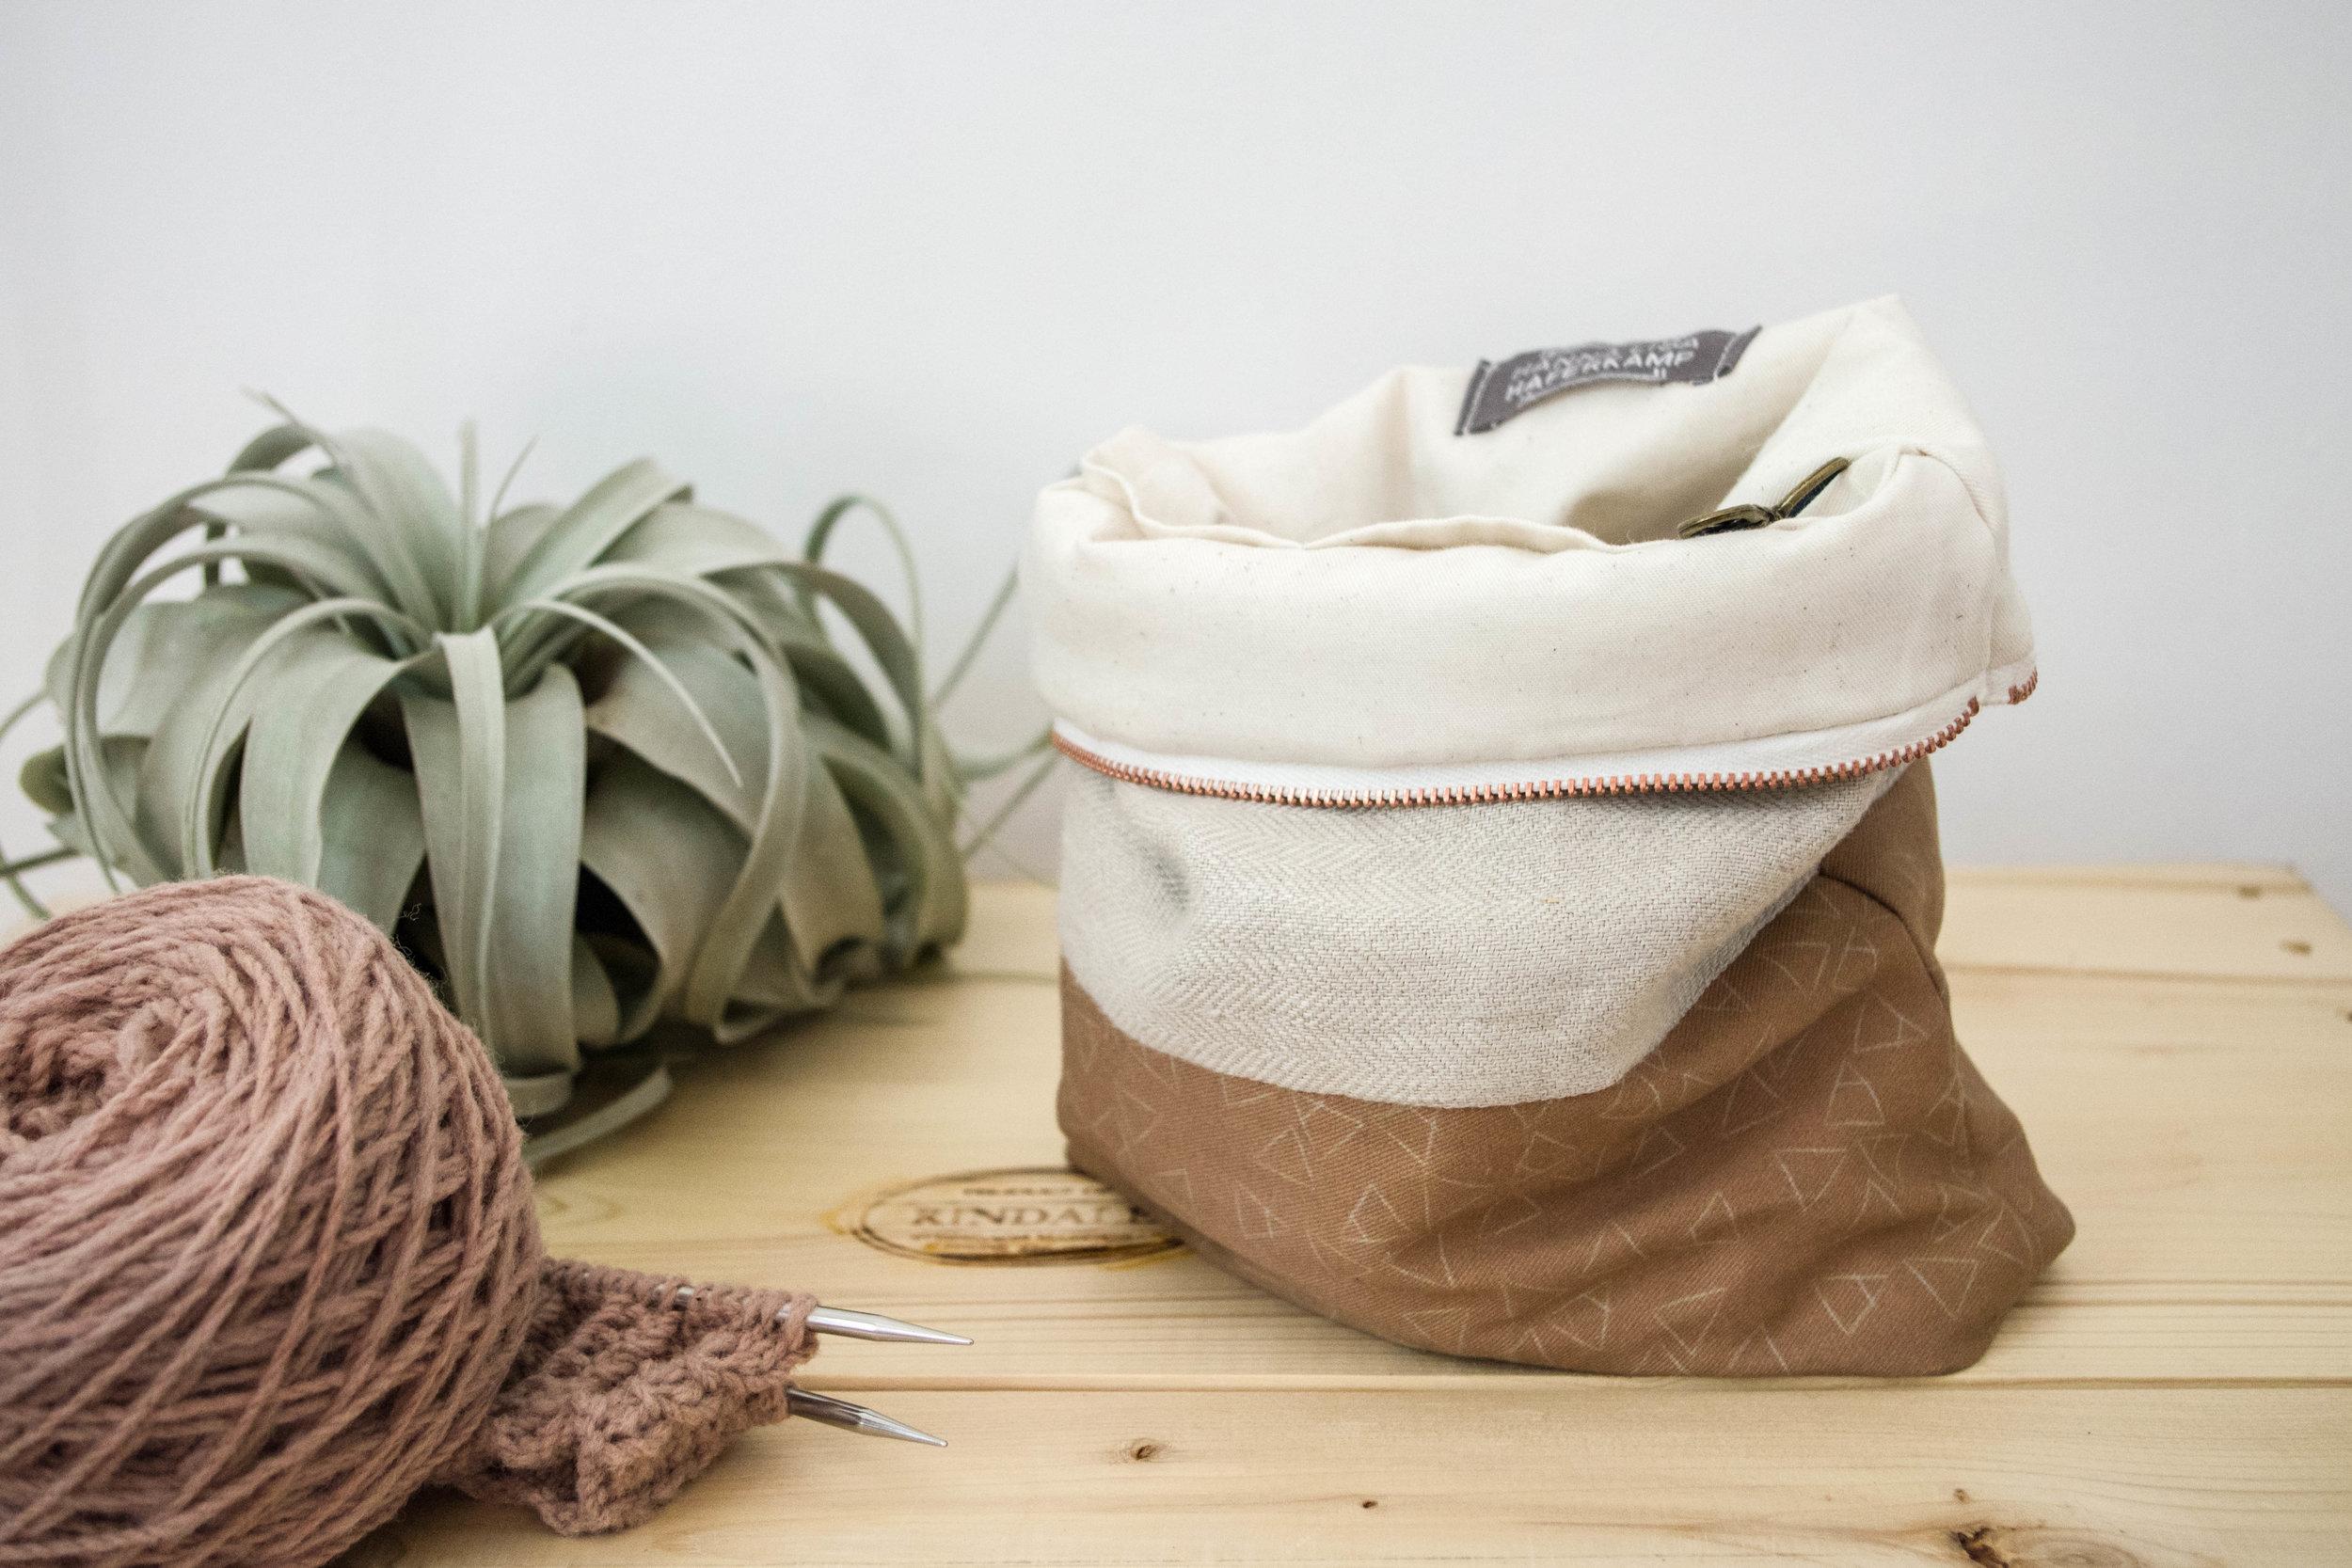 everyday magic project bags - hanna lisa haferkamp designs